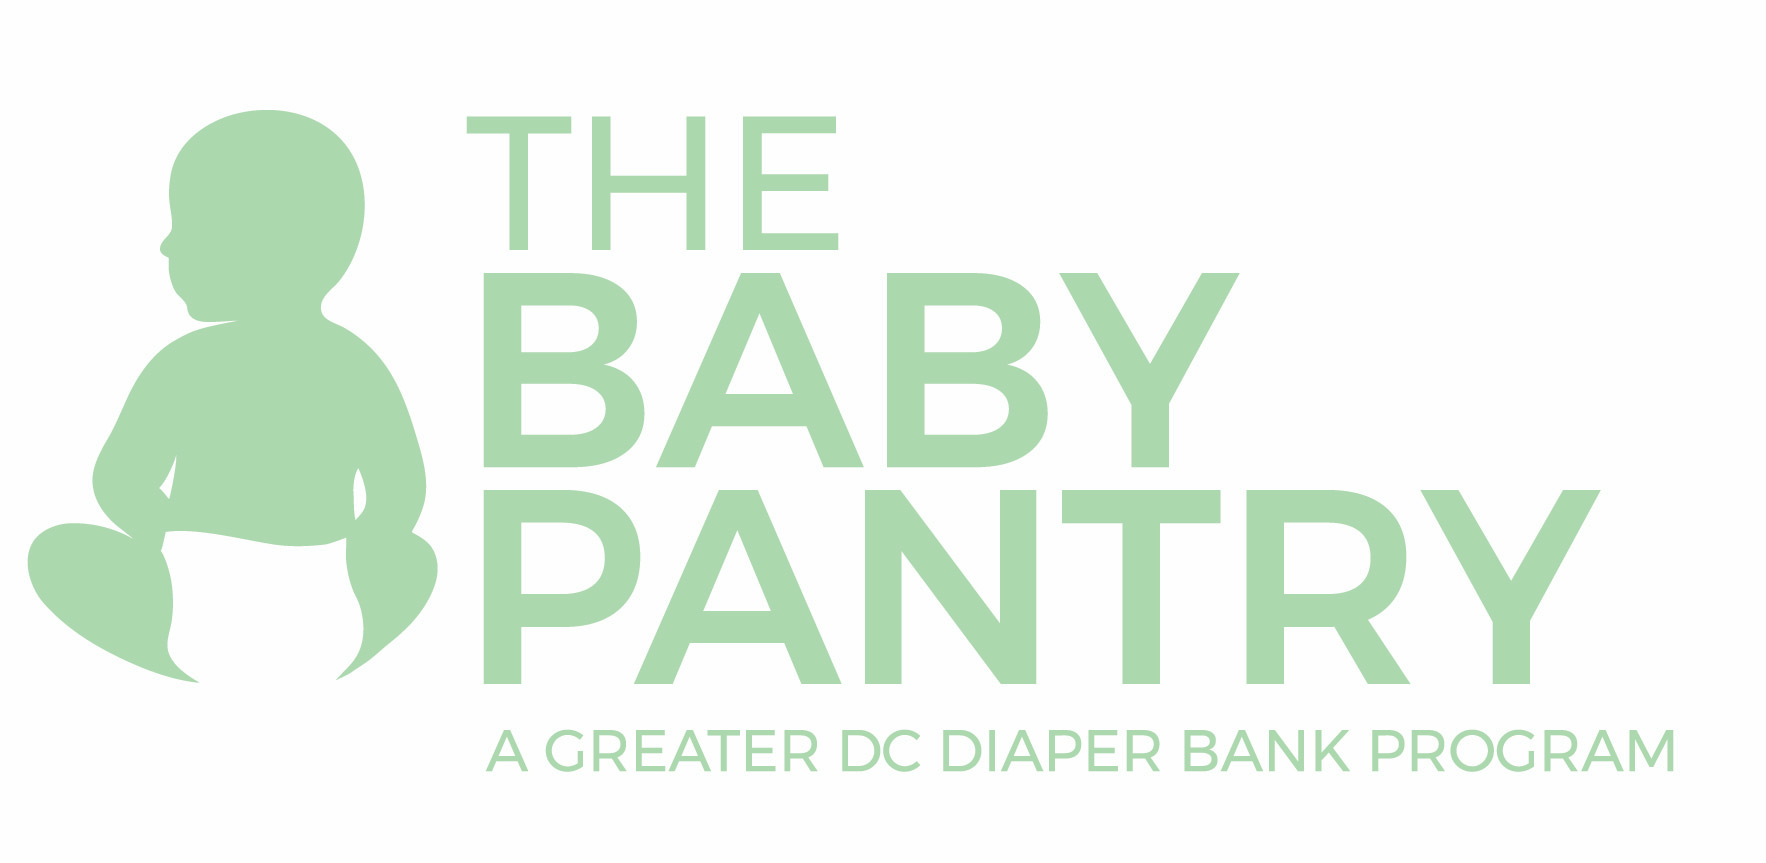 BabyPantry_Color_Tagline.png